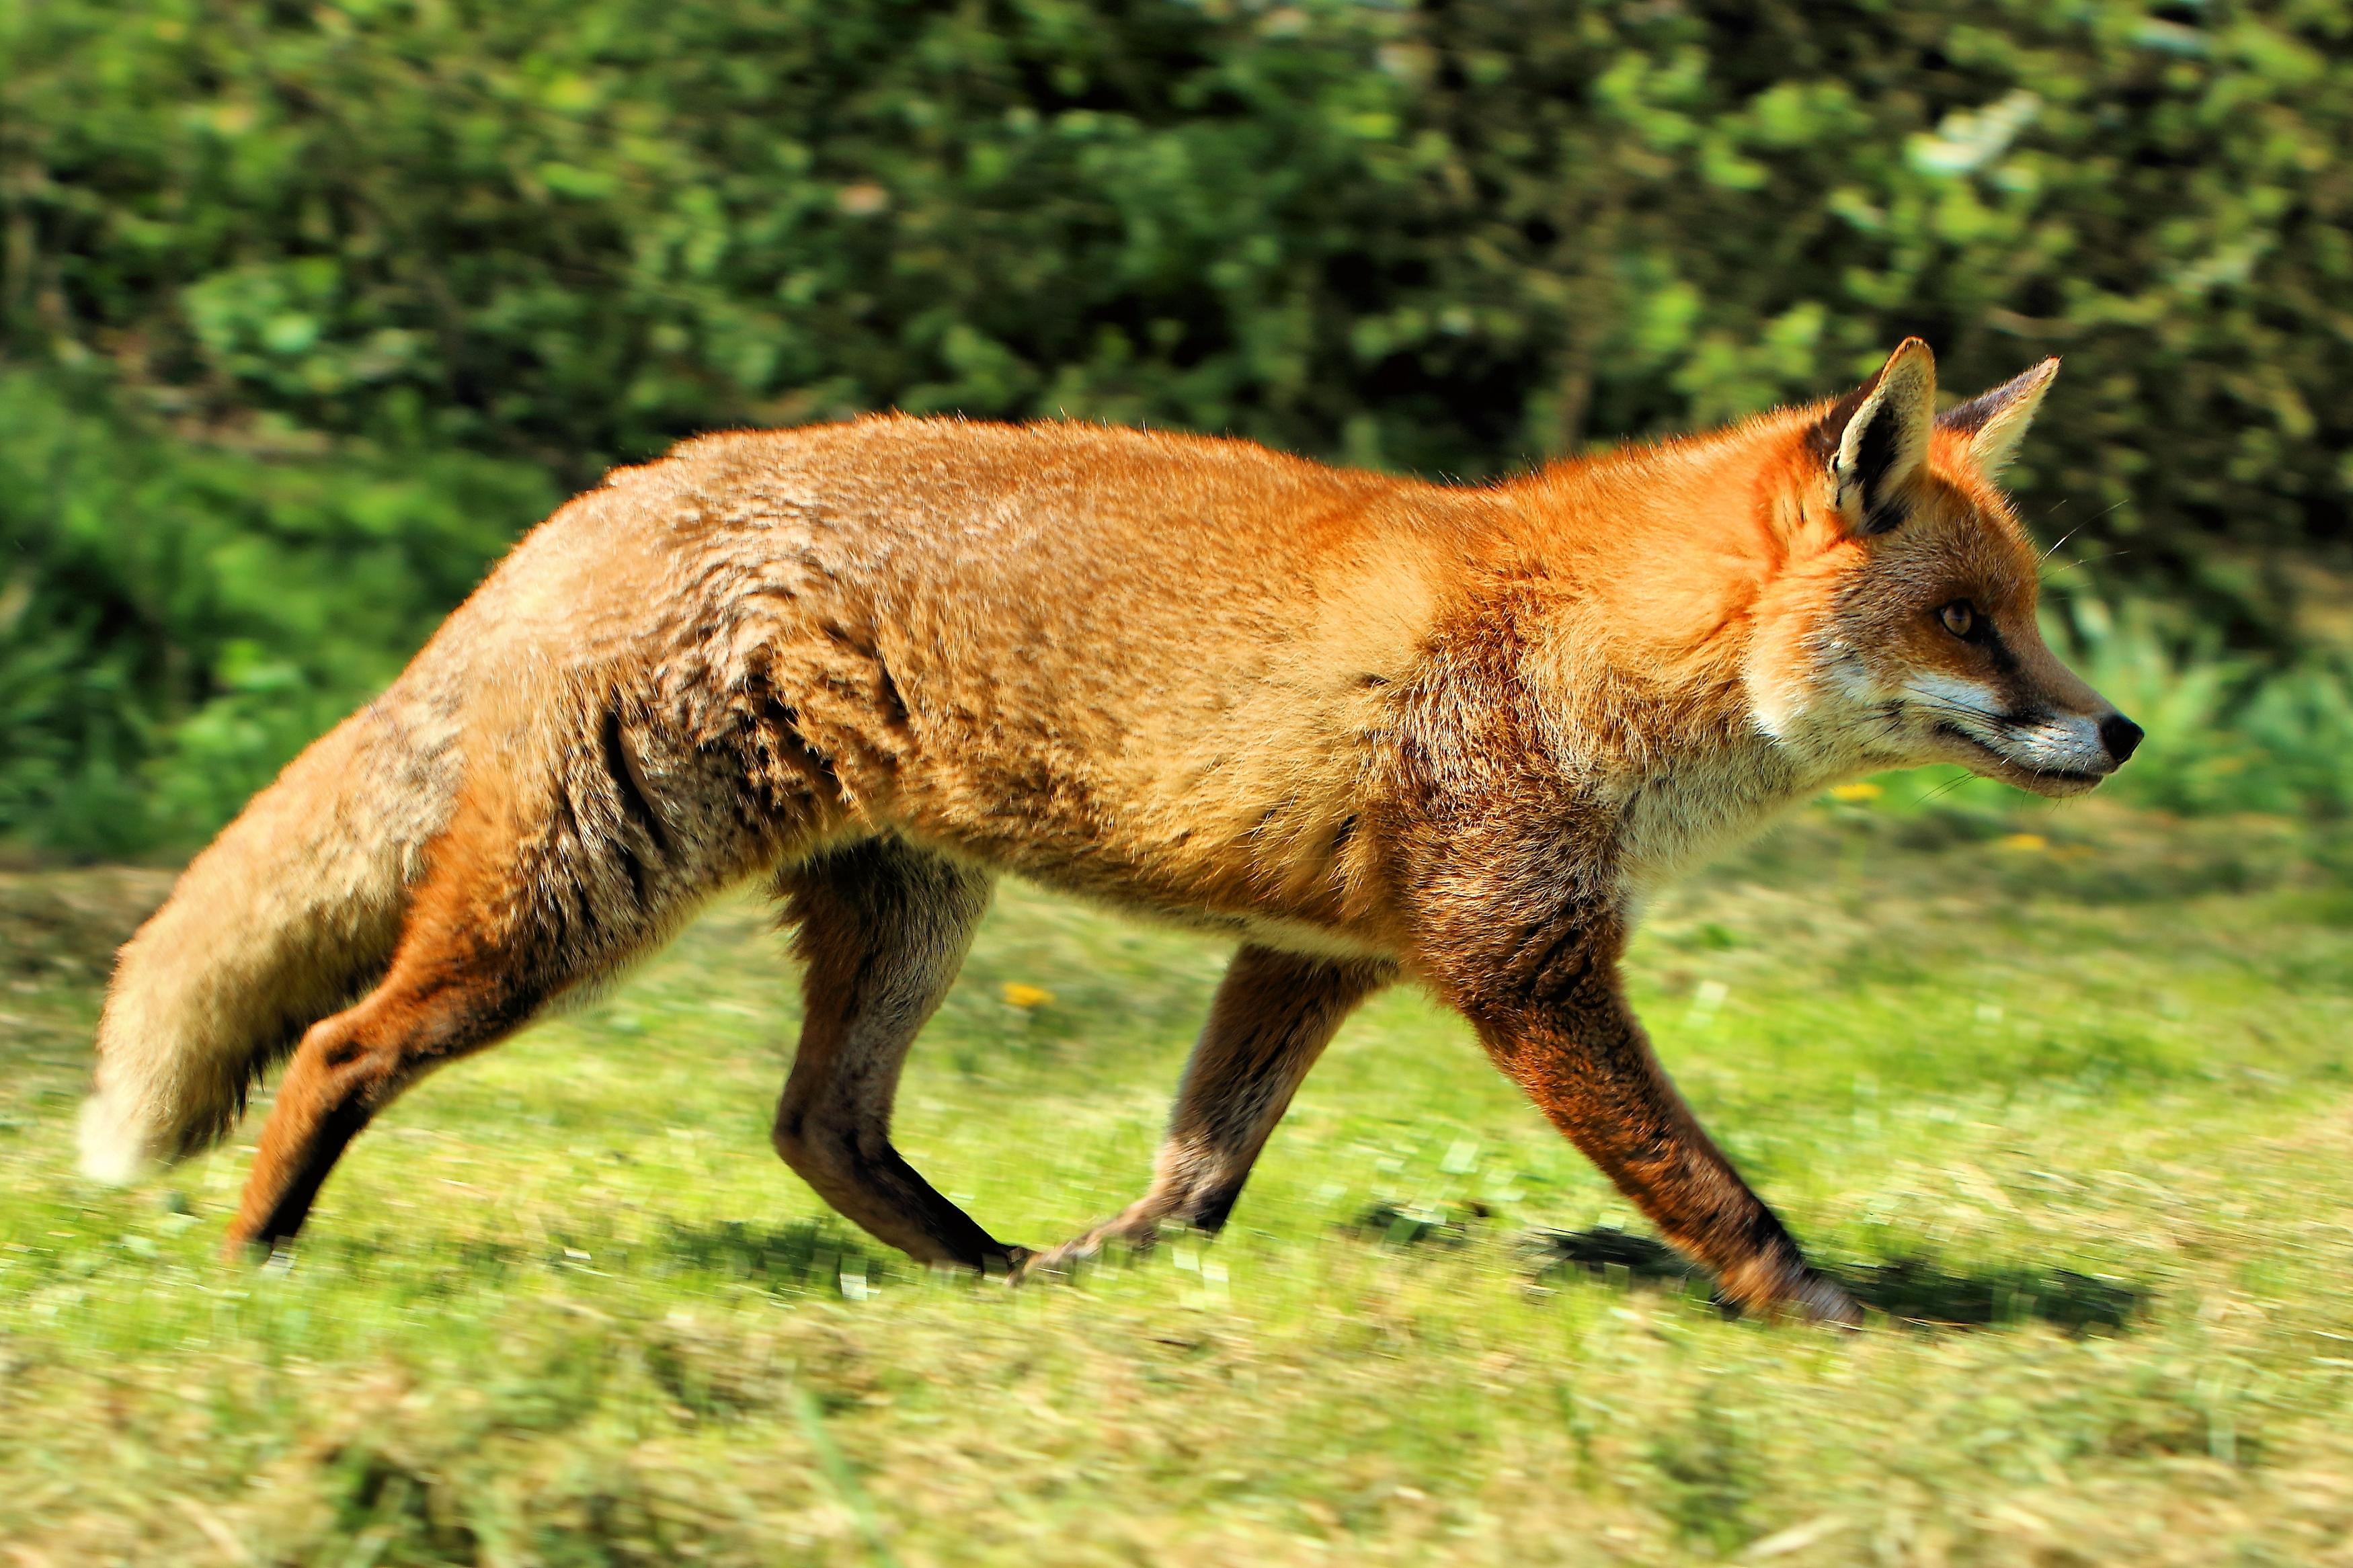 European red fox (V. v. crucigera) photographed at the British Wildlife Centre in Surrey, England. Photo taken on April 22, 2015.